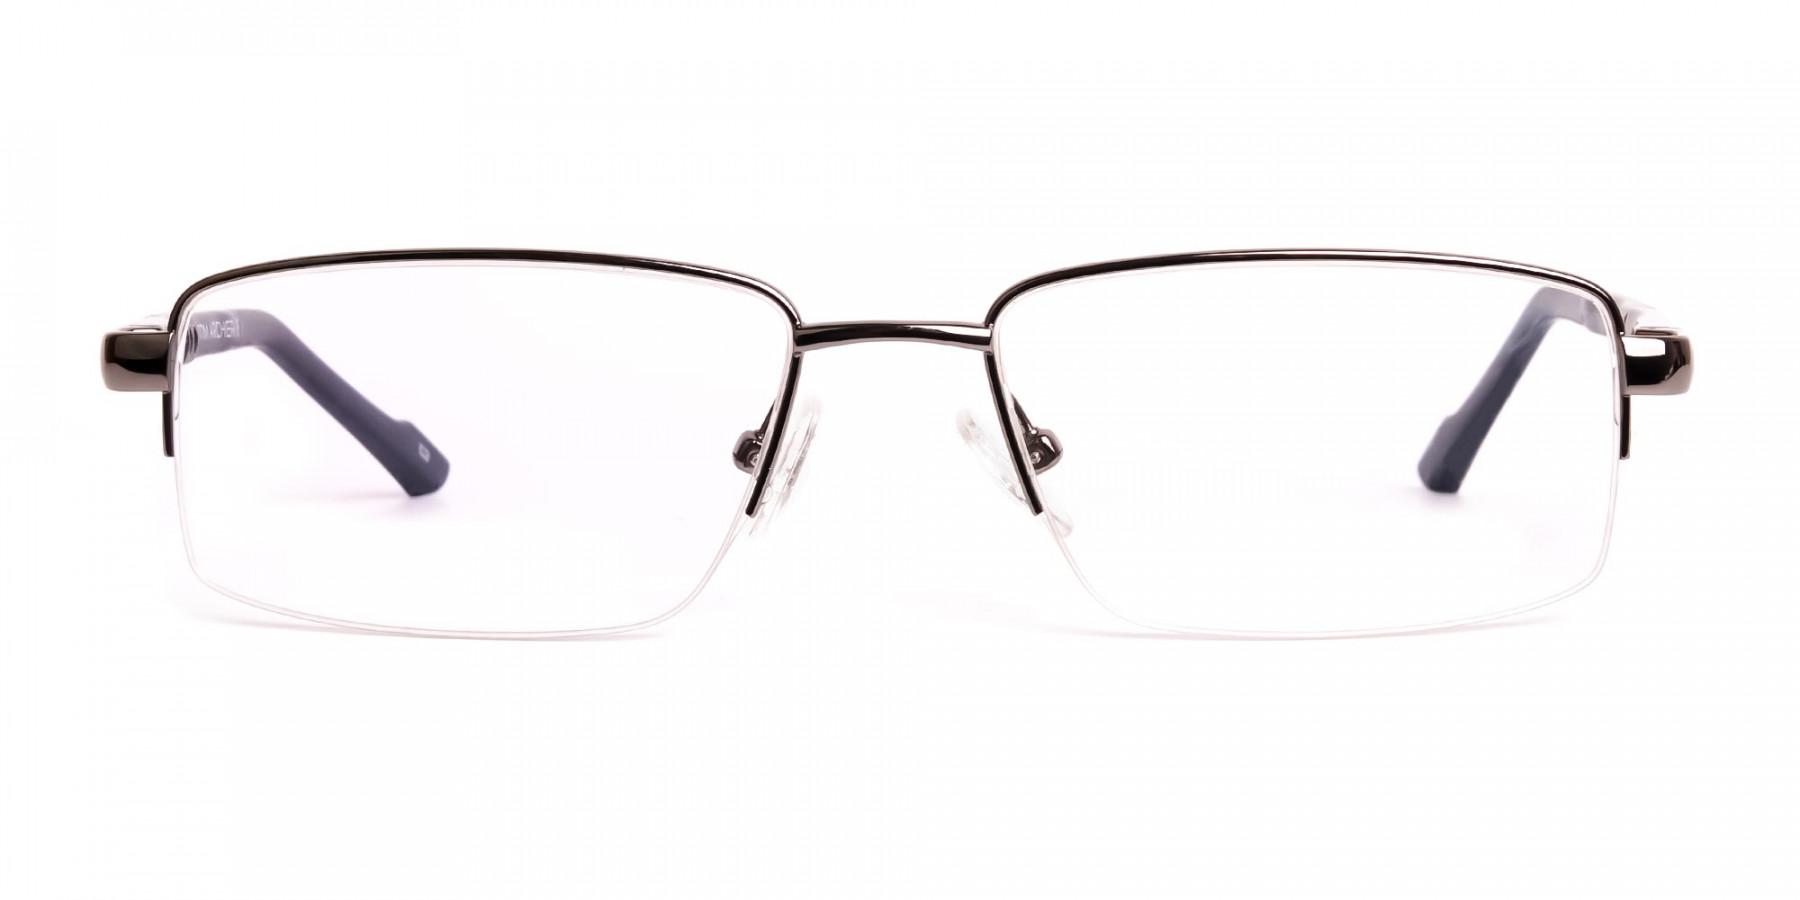 gunmetal-and-black-half-rim-rectangular-glasses-frames -1